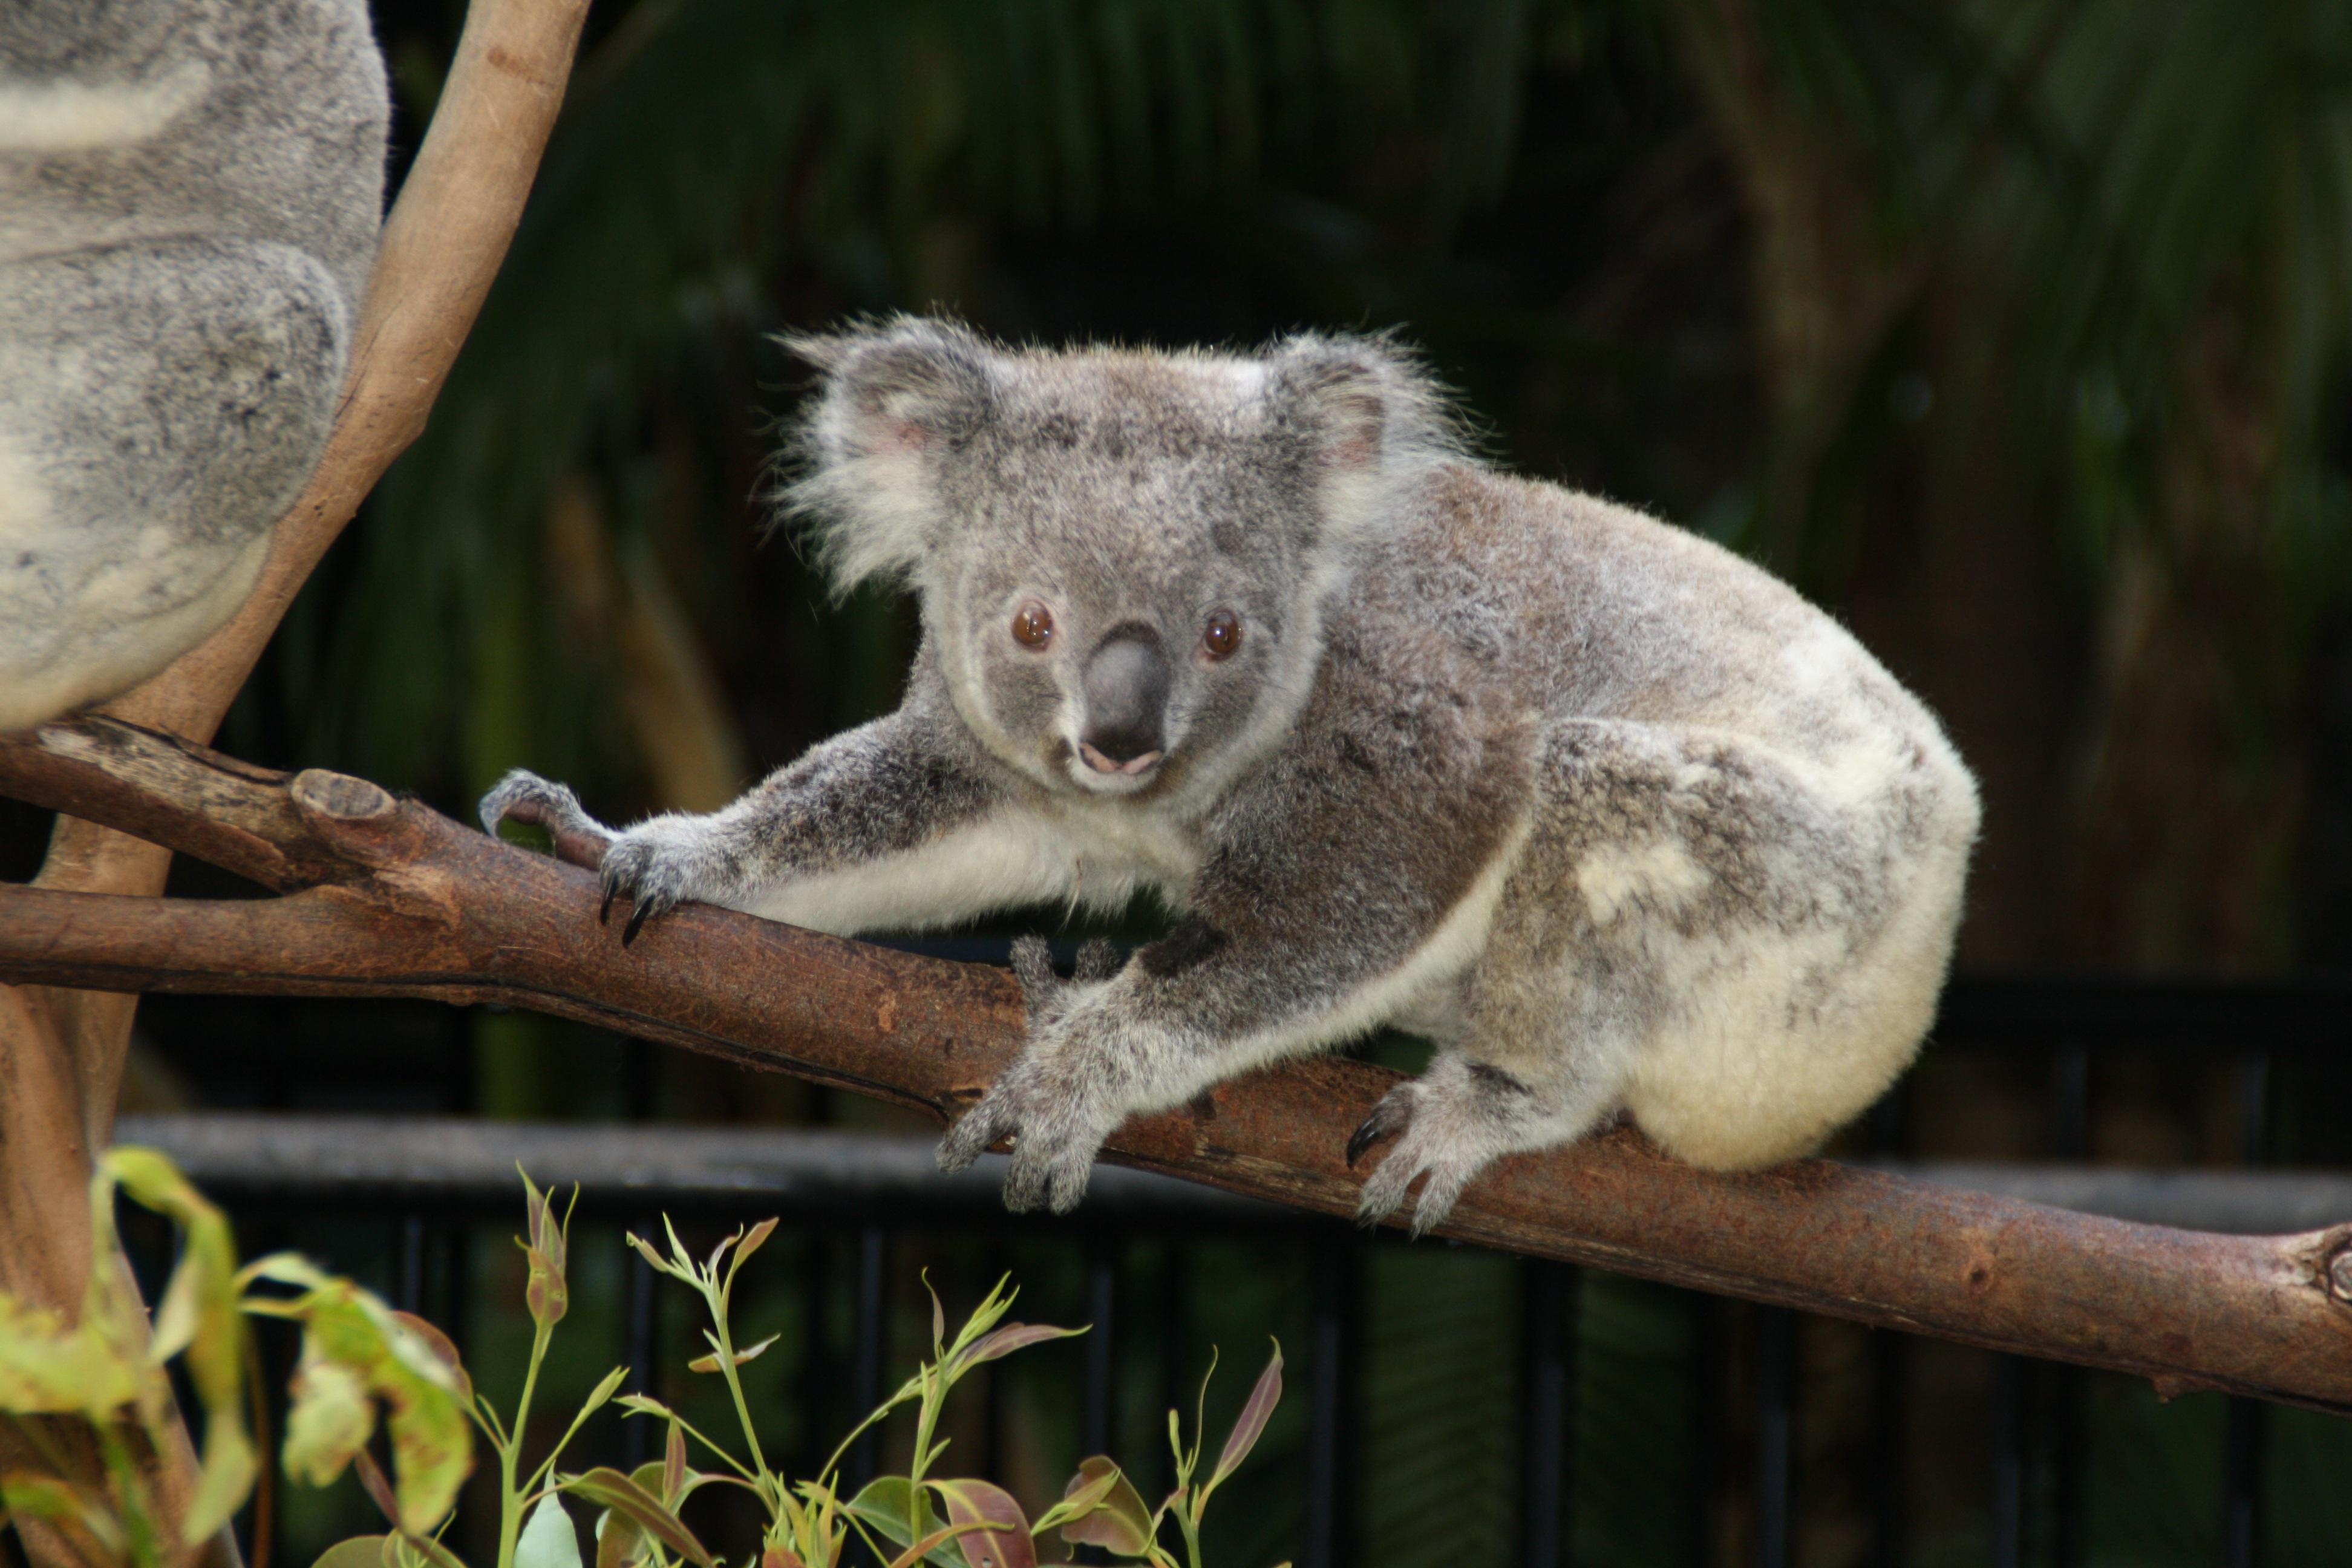 Bildet : dyreliv, dyrehage, pattedyr, fauna, Australia, dyr, virveldyr, koala, pungdyr 3888x2592 ...